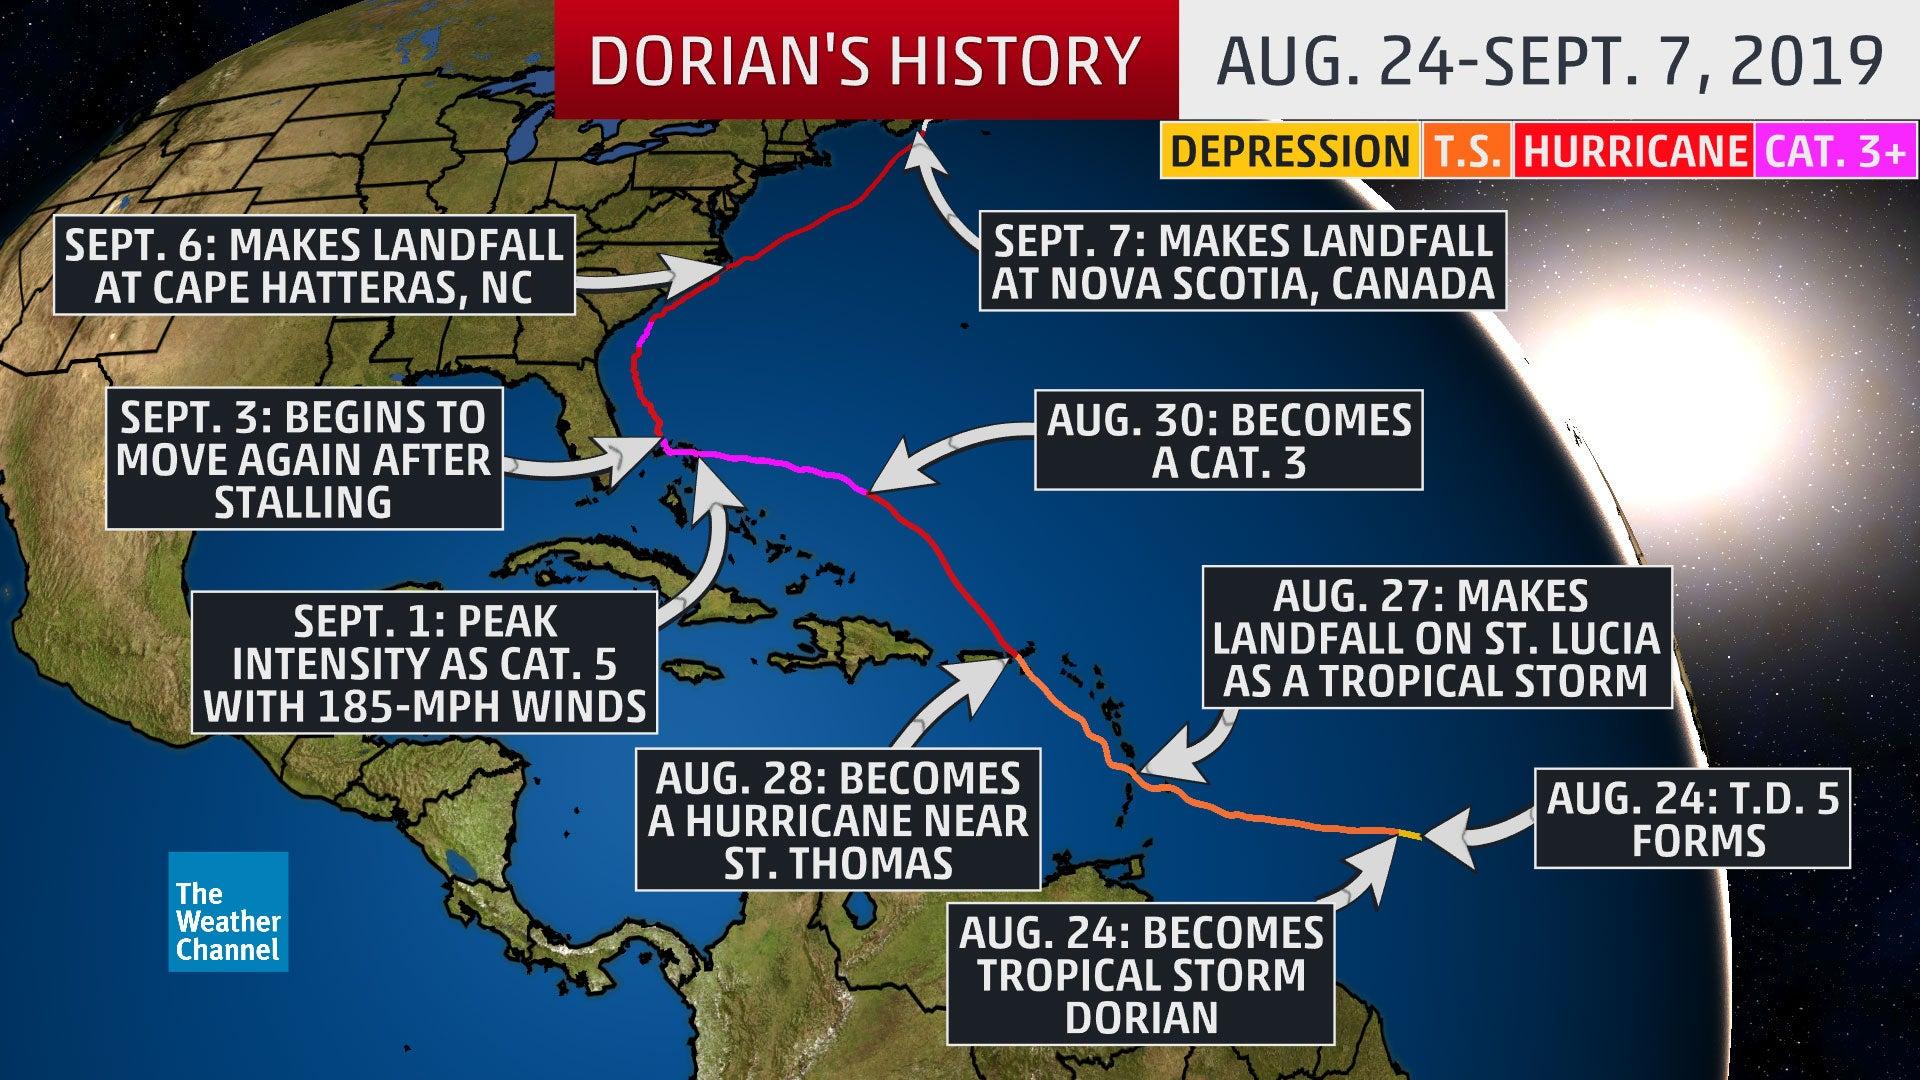 Hurricane Dorian Leaves A Trail Of Destruction In Its Wake